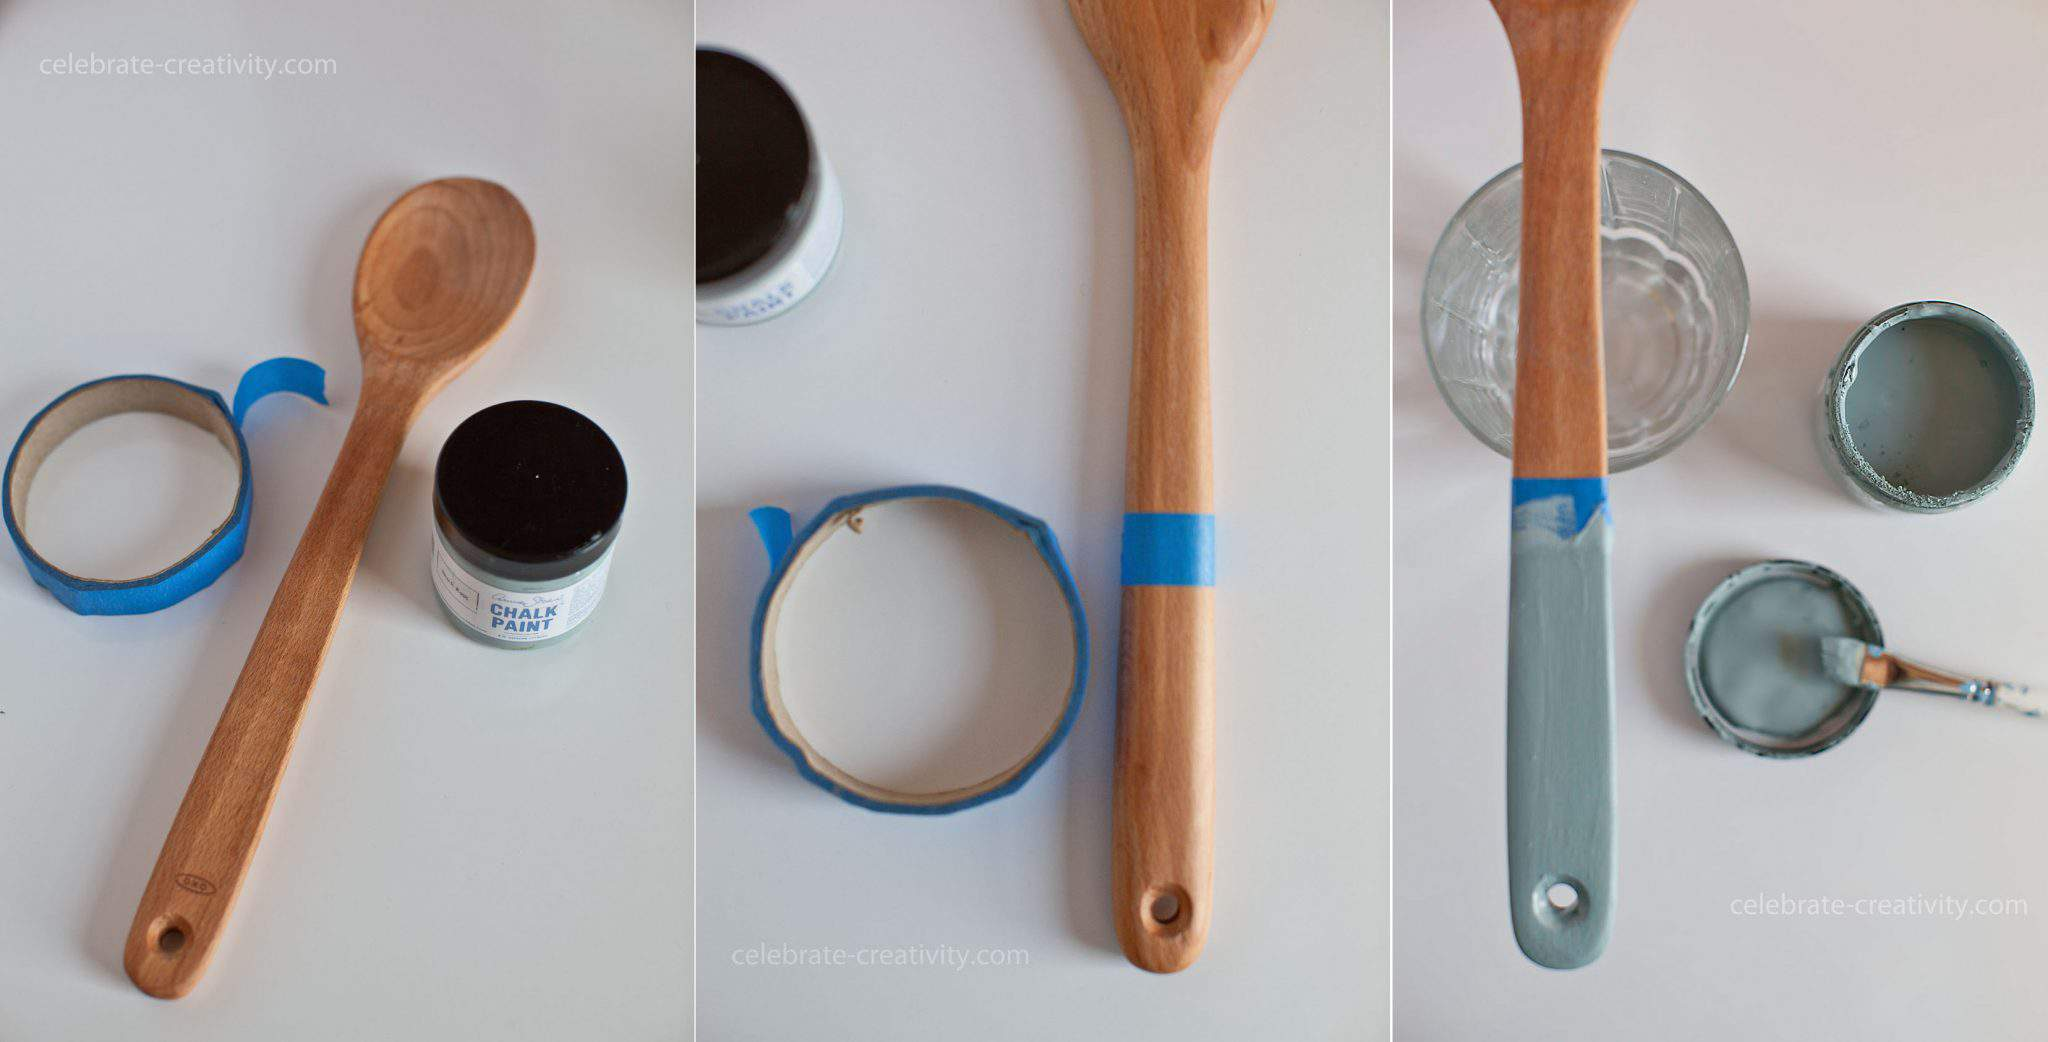 Duck Egg Blue Kitchen Utensils Celebrate Creativity